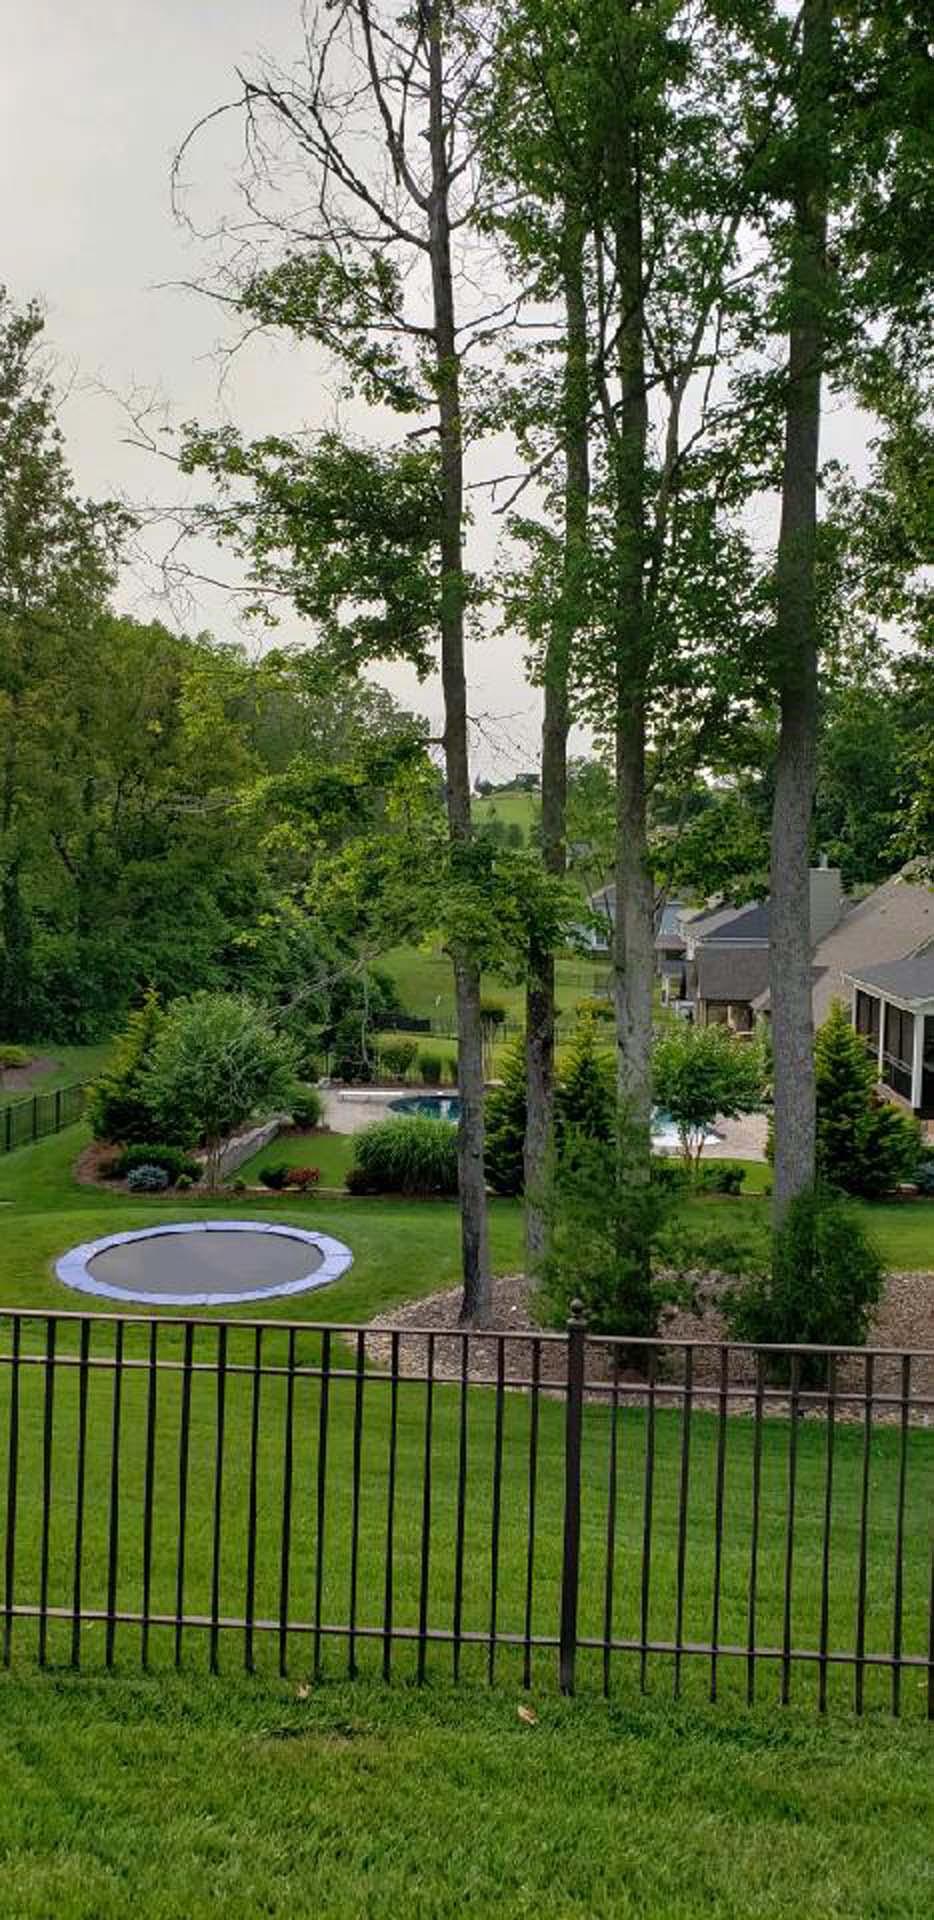 Backyard Of A House